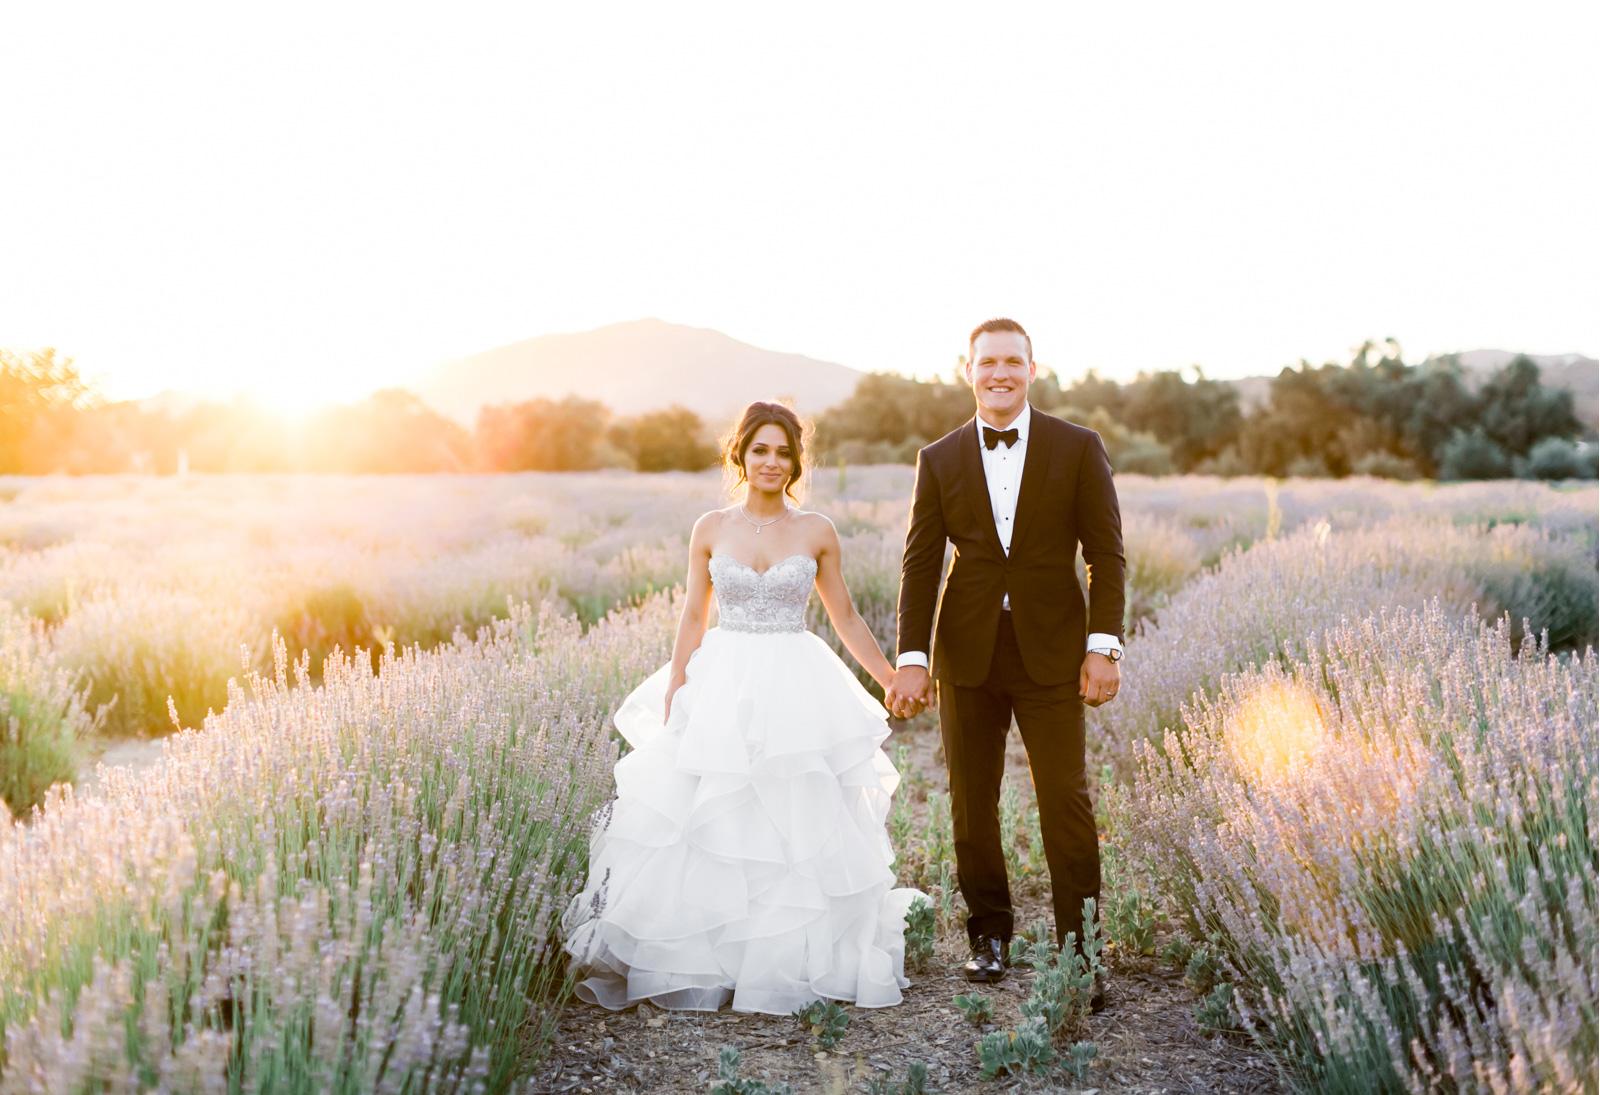 California-Lavender-Field-Wedding-Natalie-Schutt-Photography-Style-Me-Pretty_18.jpg